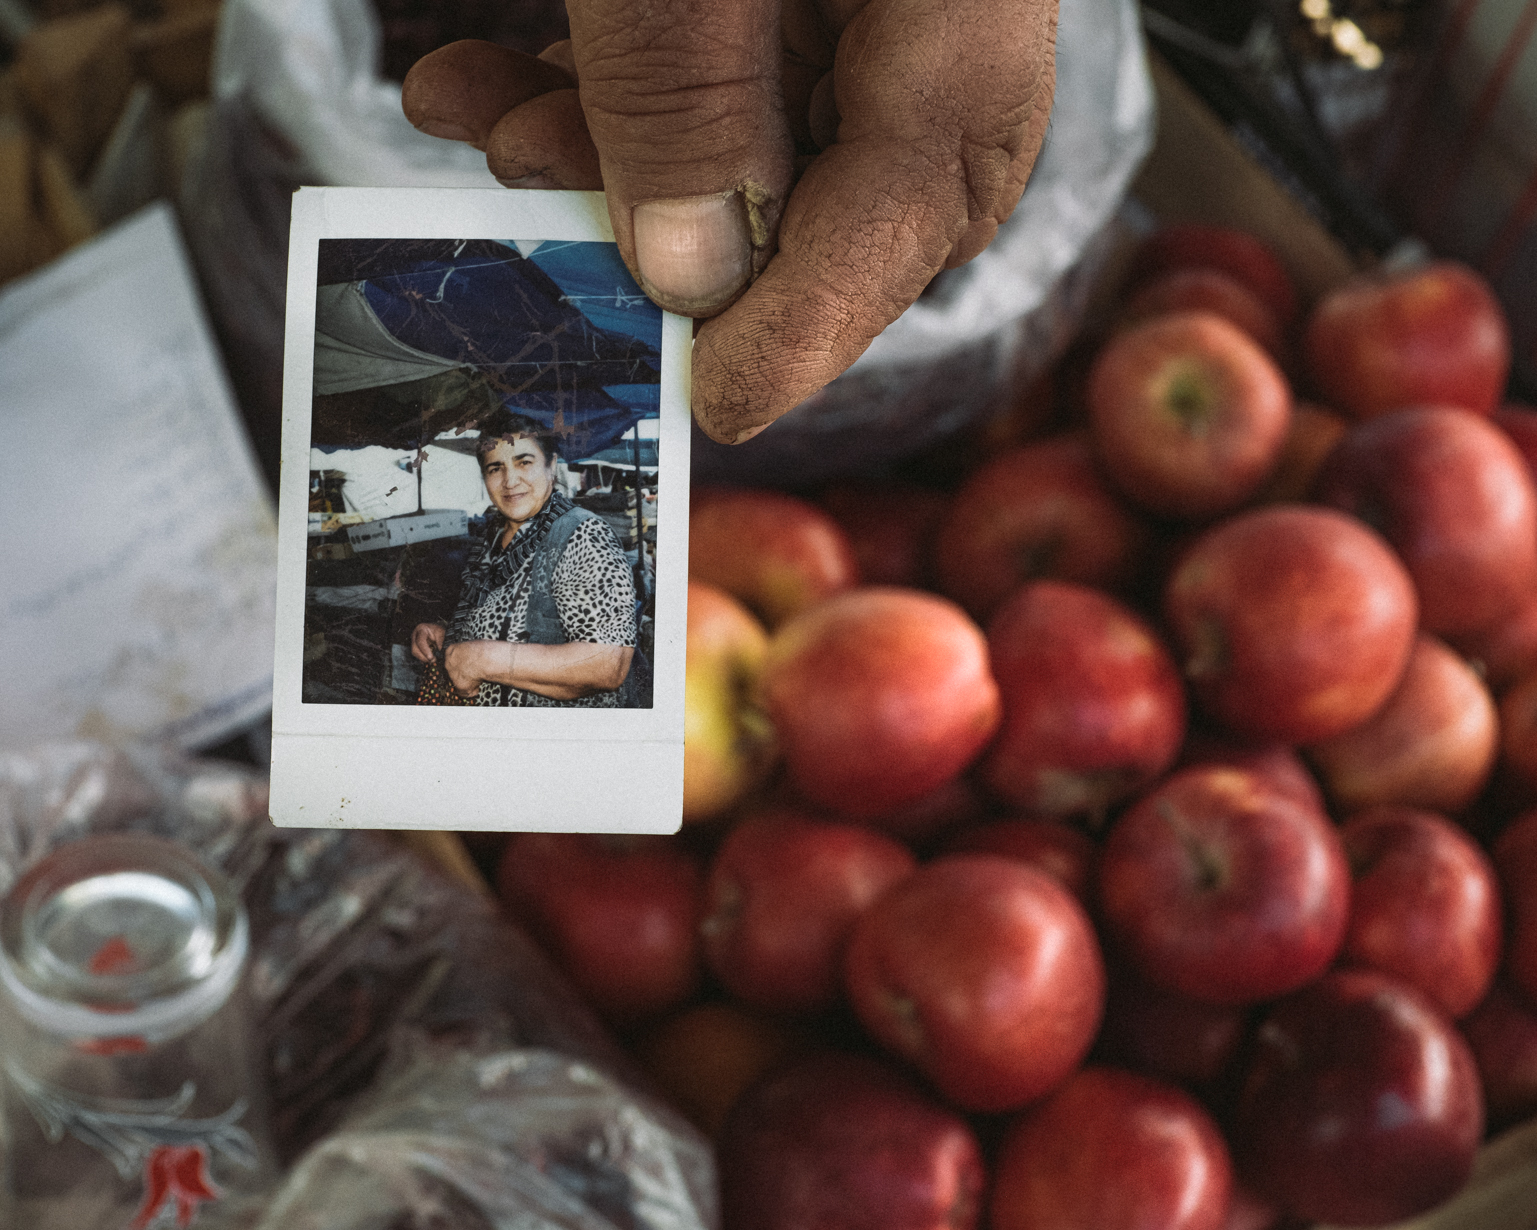 A Polaroid snapshot of Rafiga made by Japanese tourists in 2020. Shaki, 2021